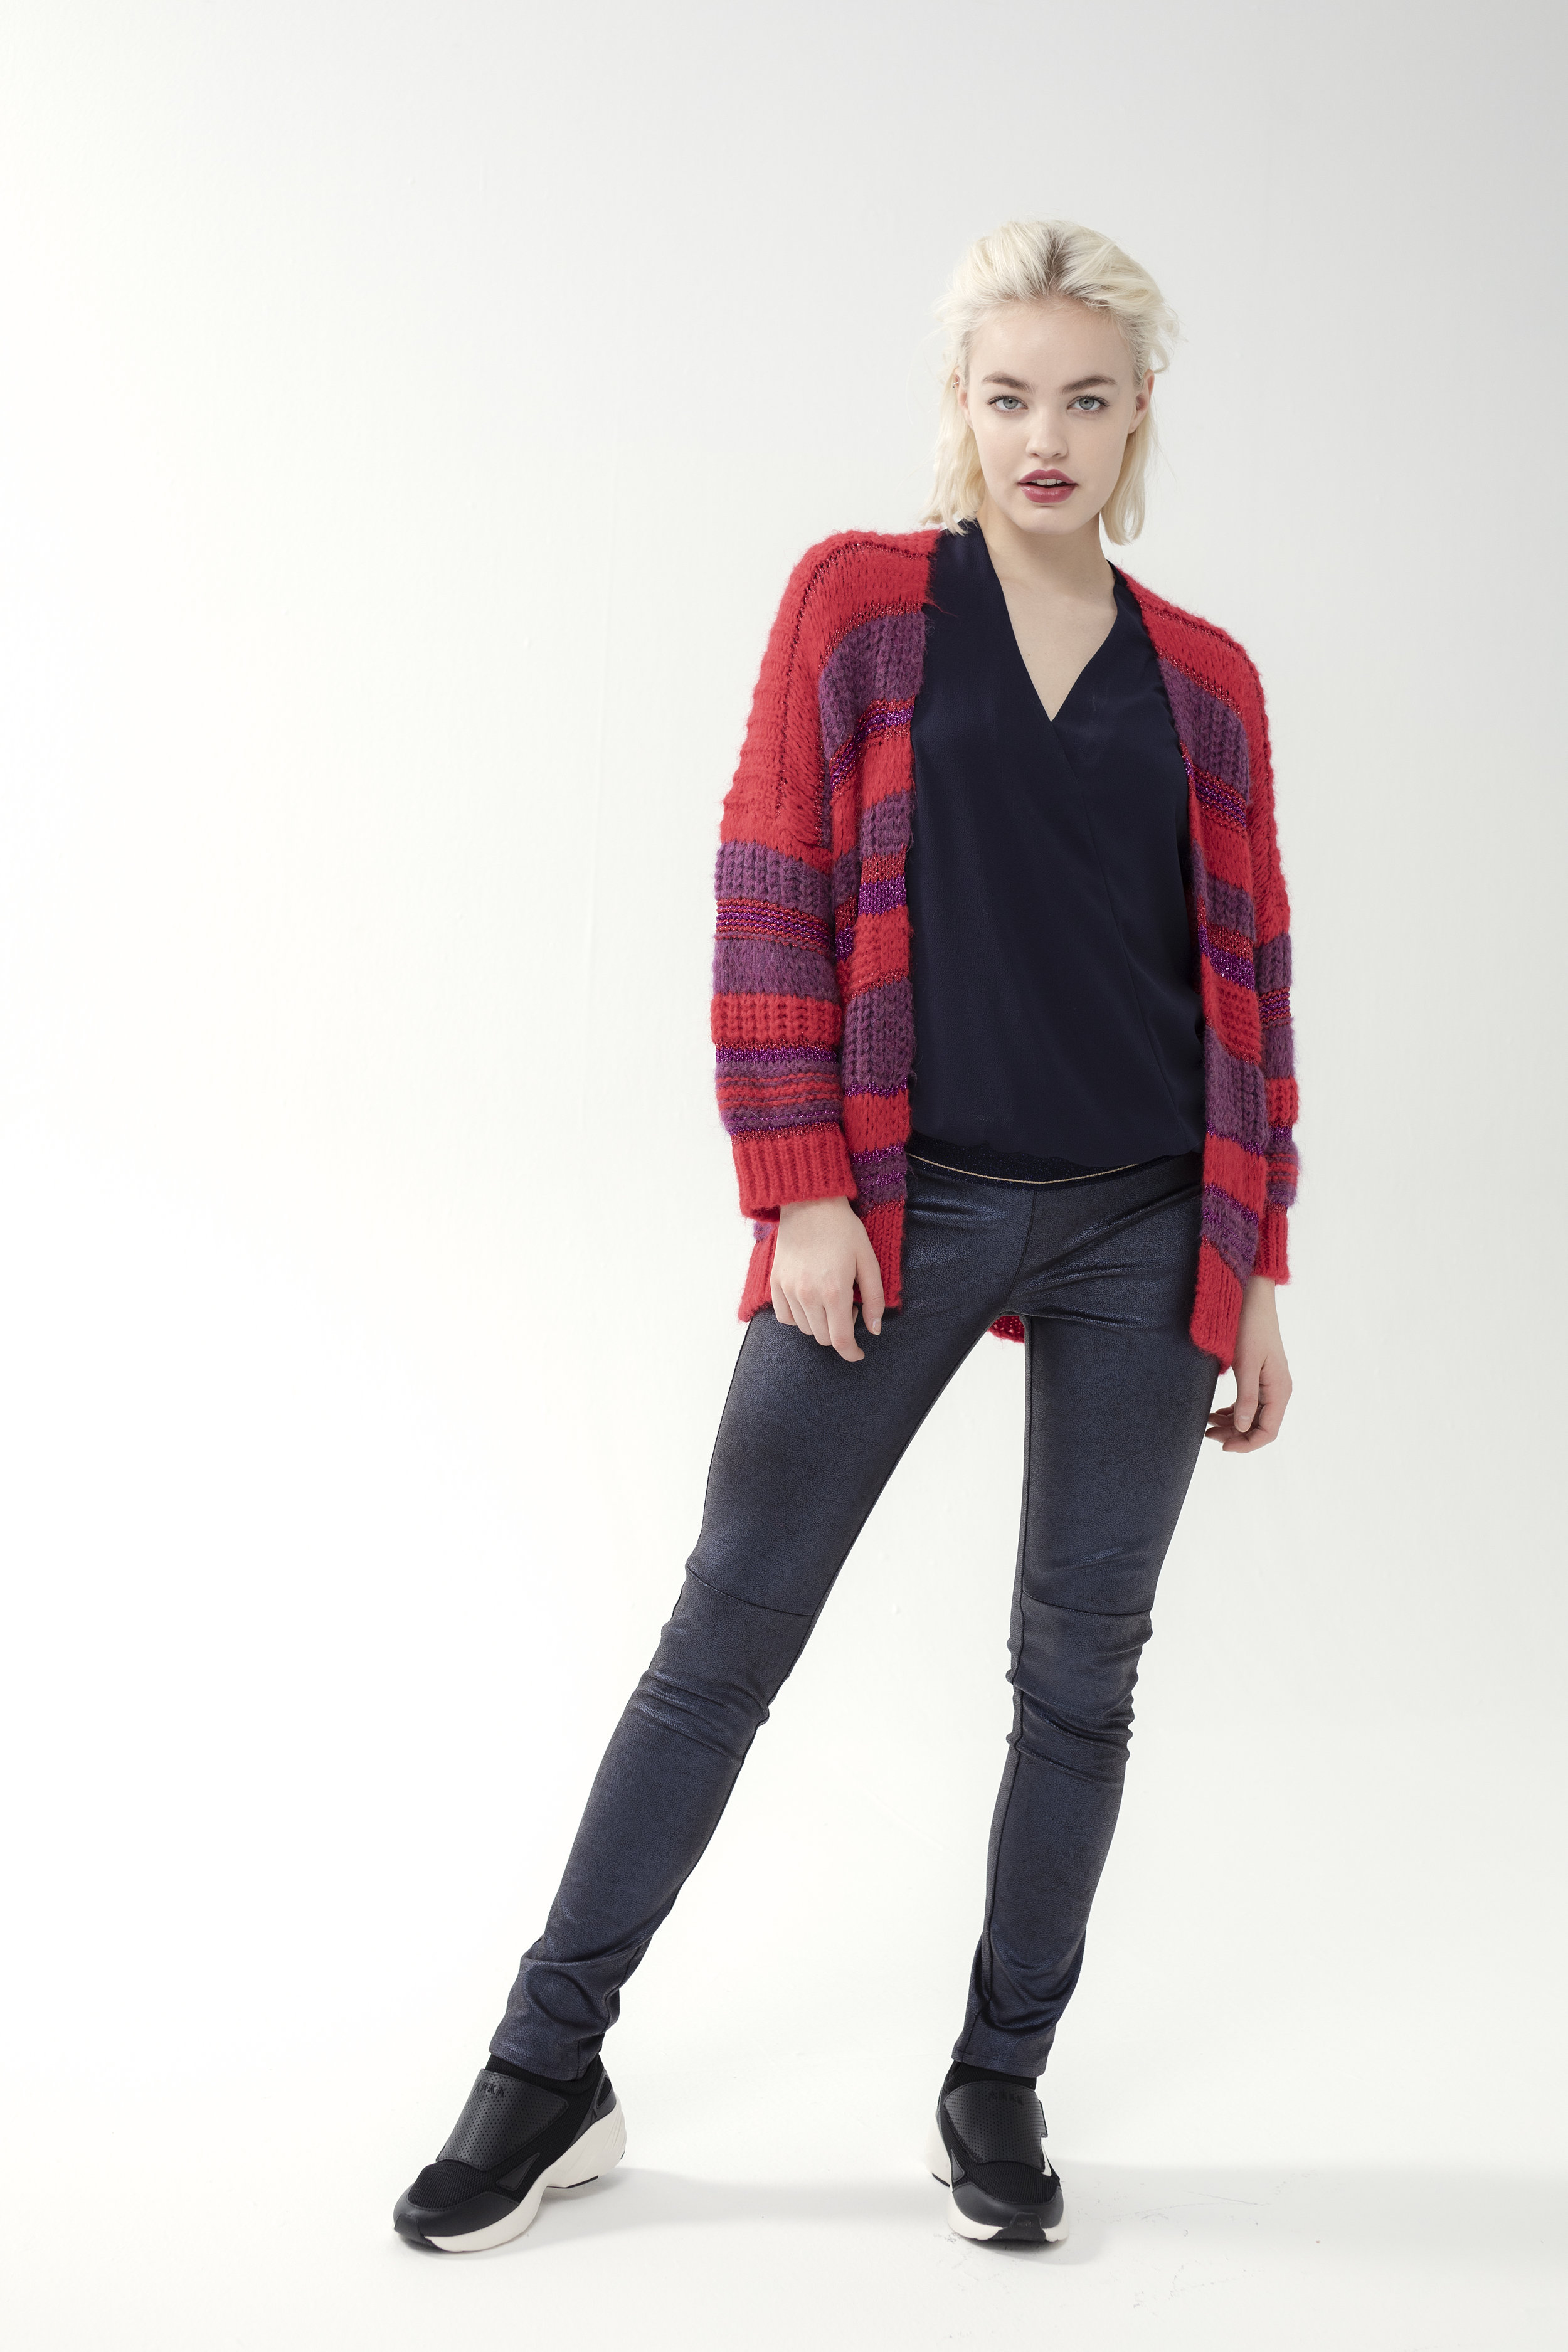 Shirt FONDANT - crepe | Cardigan CAROLA - atalanta | Trouser TROSSA - zamp